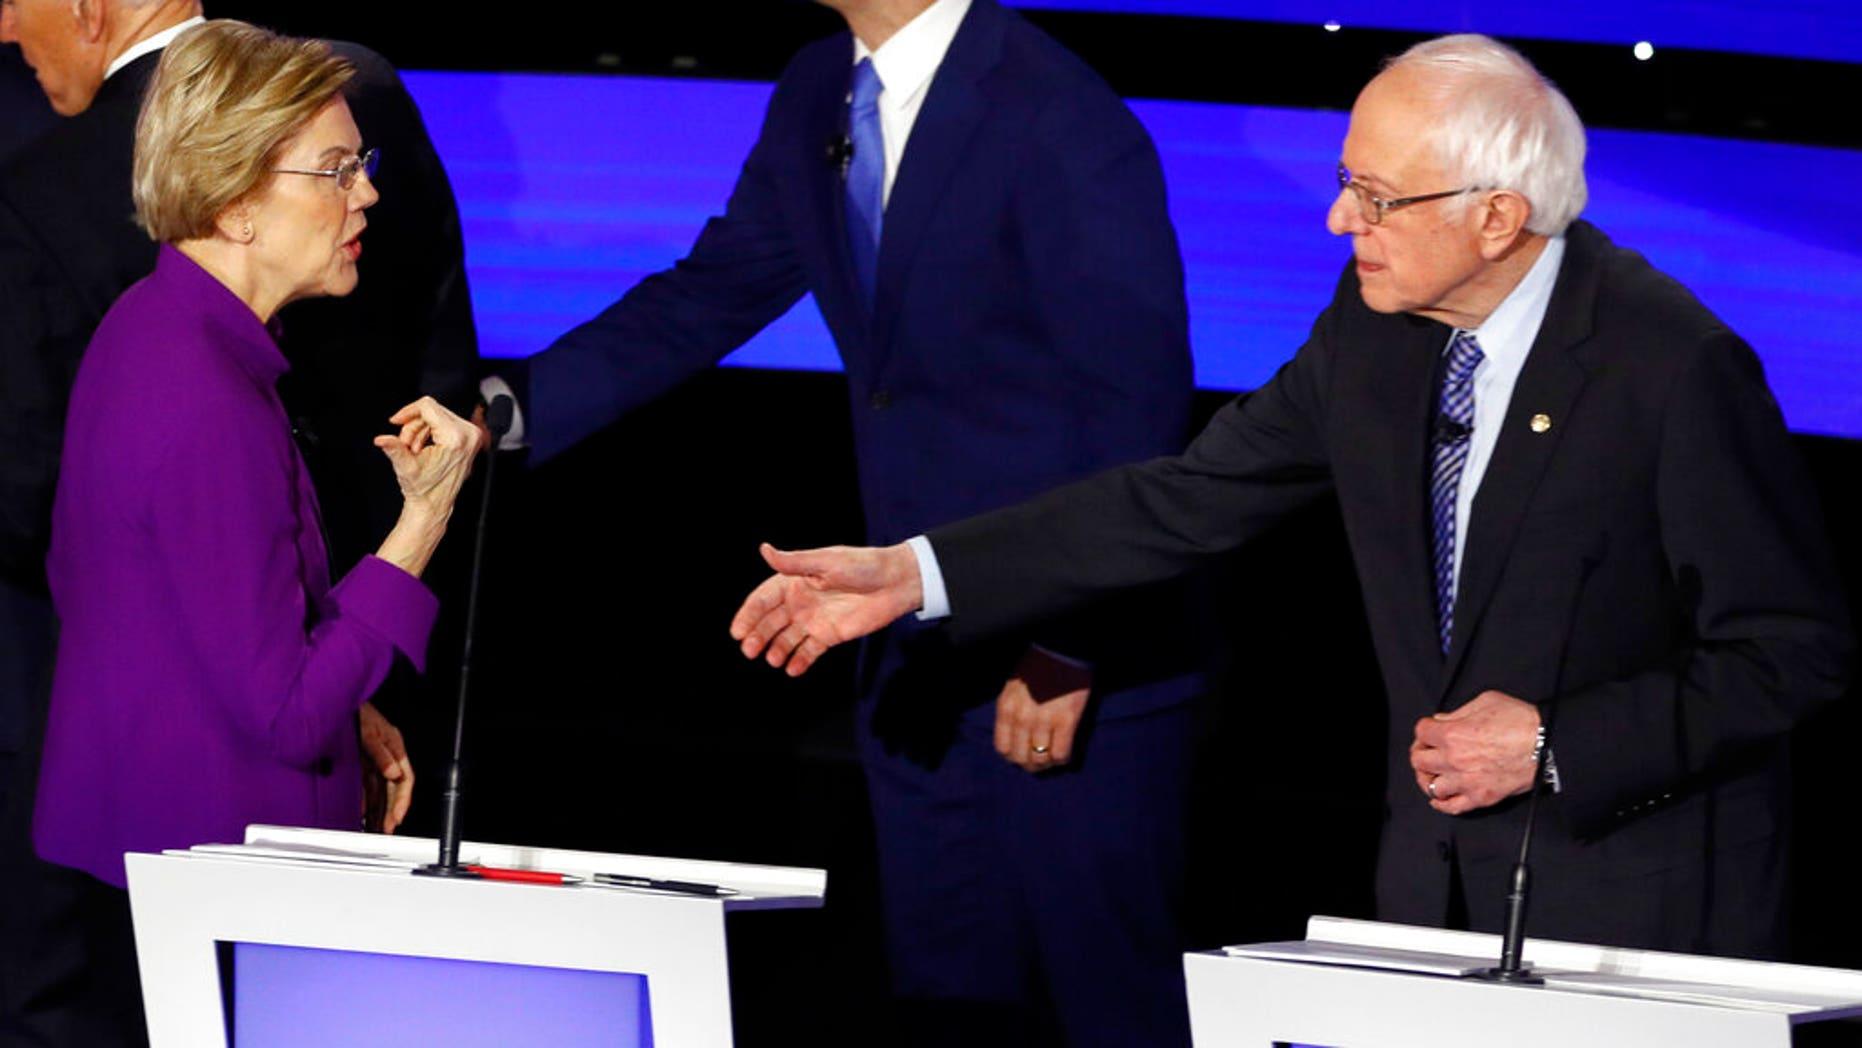 Westlake Legal Group WarrenSandersA_011520 Warren appears to refuse Sanders handshake after clashes over sexism in final Dem debate before Iowa caucuses fox-news/columns/fox-news-first fox news fnc/us fnc article 0b67bdb8-6b98-5249-92ca-958fb439776d